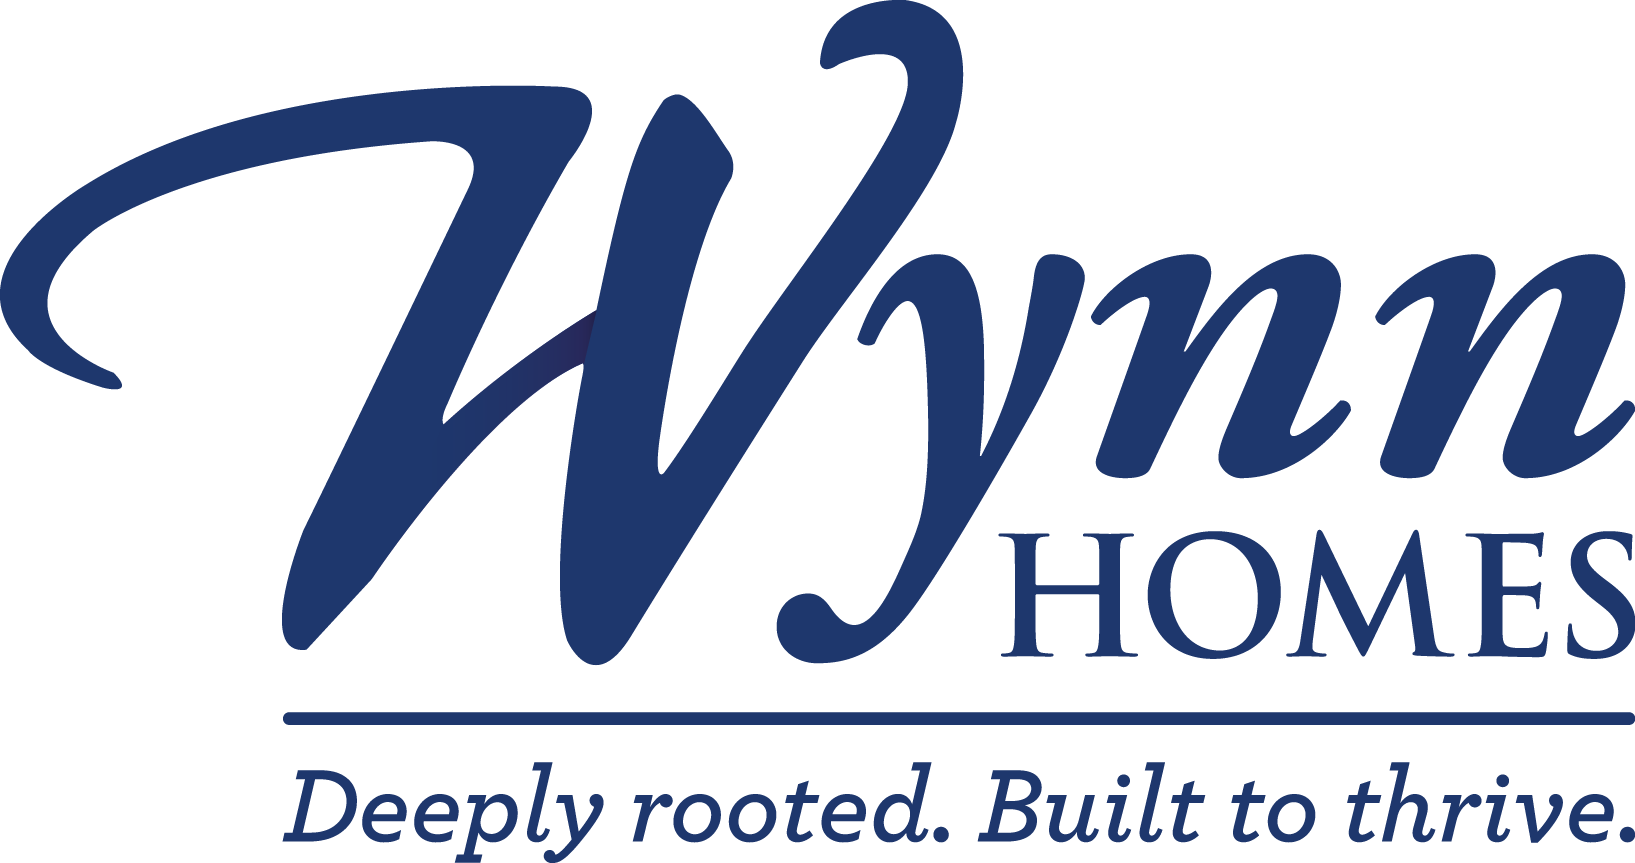 wynn homes new homes logo